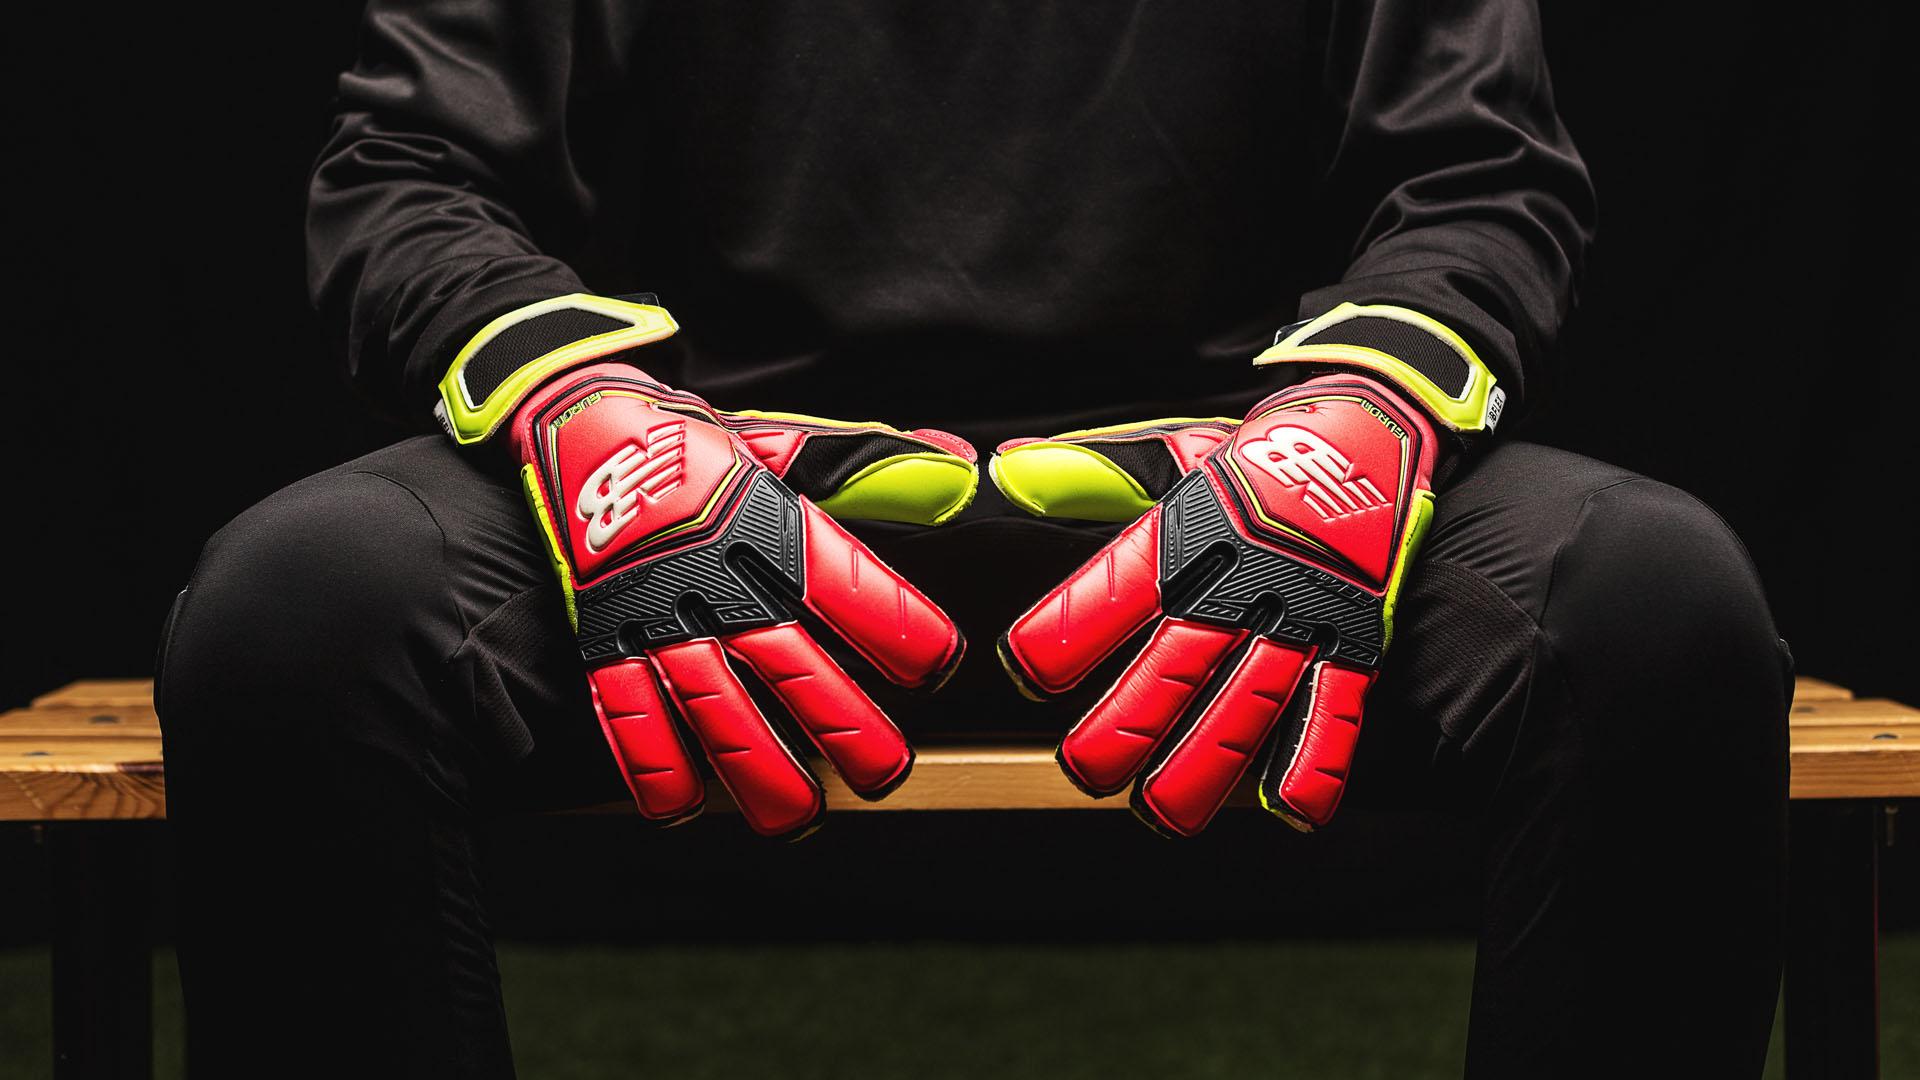 13b97de4d Review of Kasper Schmeichels Furon Destroy goalkeeper glove